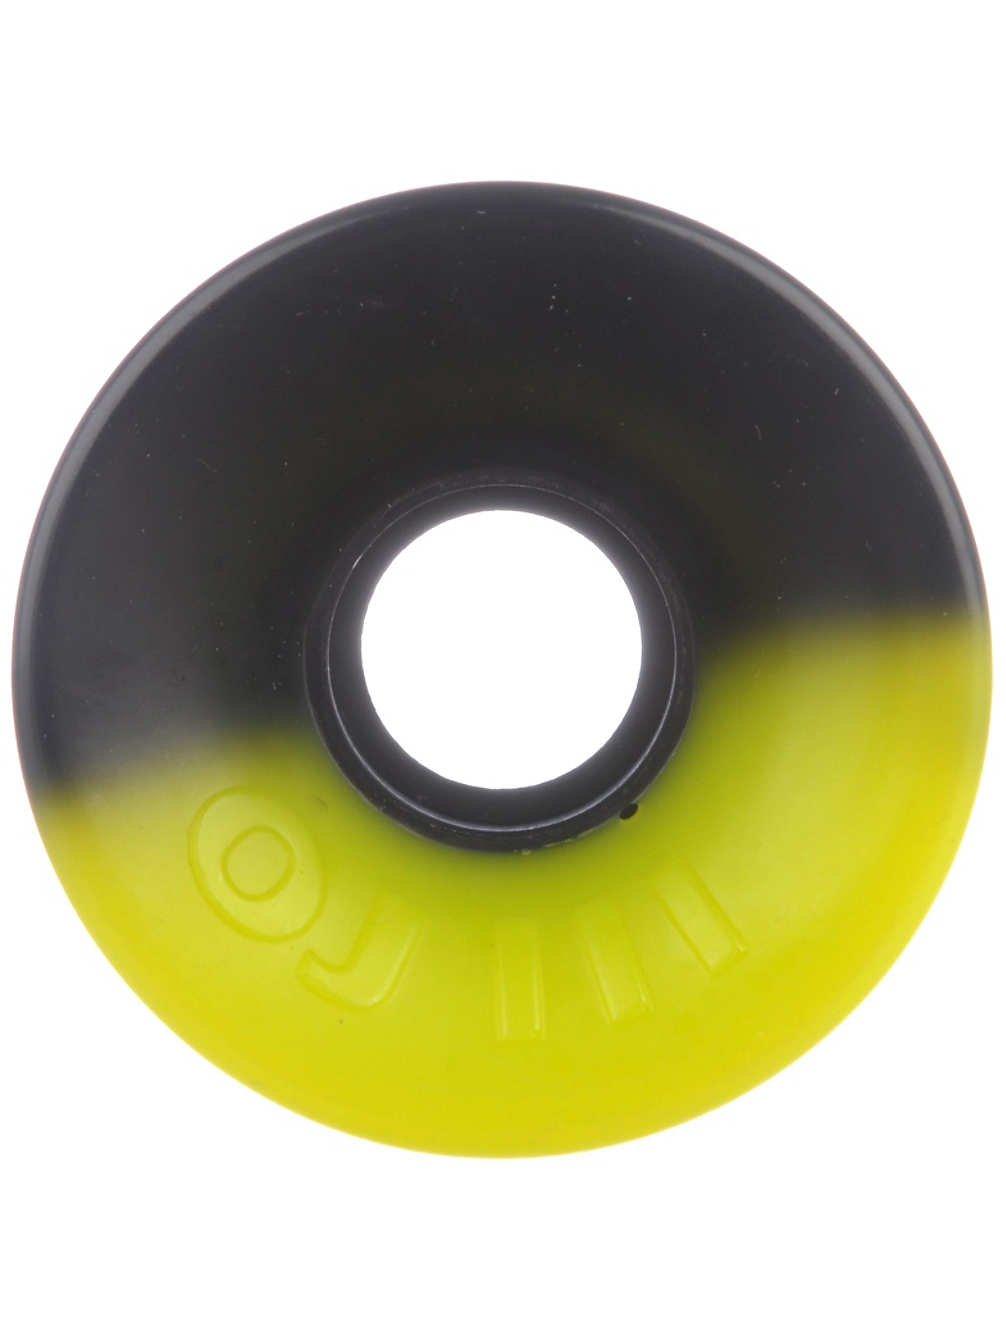 OJ Wheels Hot Juice 5050 78a Skateboard Wheel, 60mm, Yellow/Black by Oj Wheels   B01HQ3UJGI